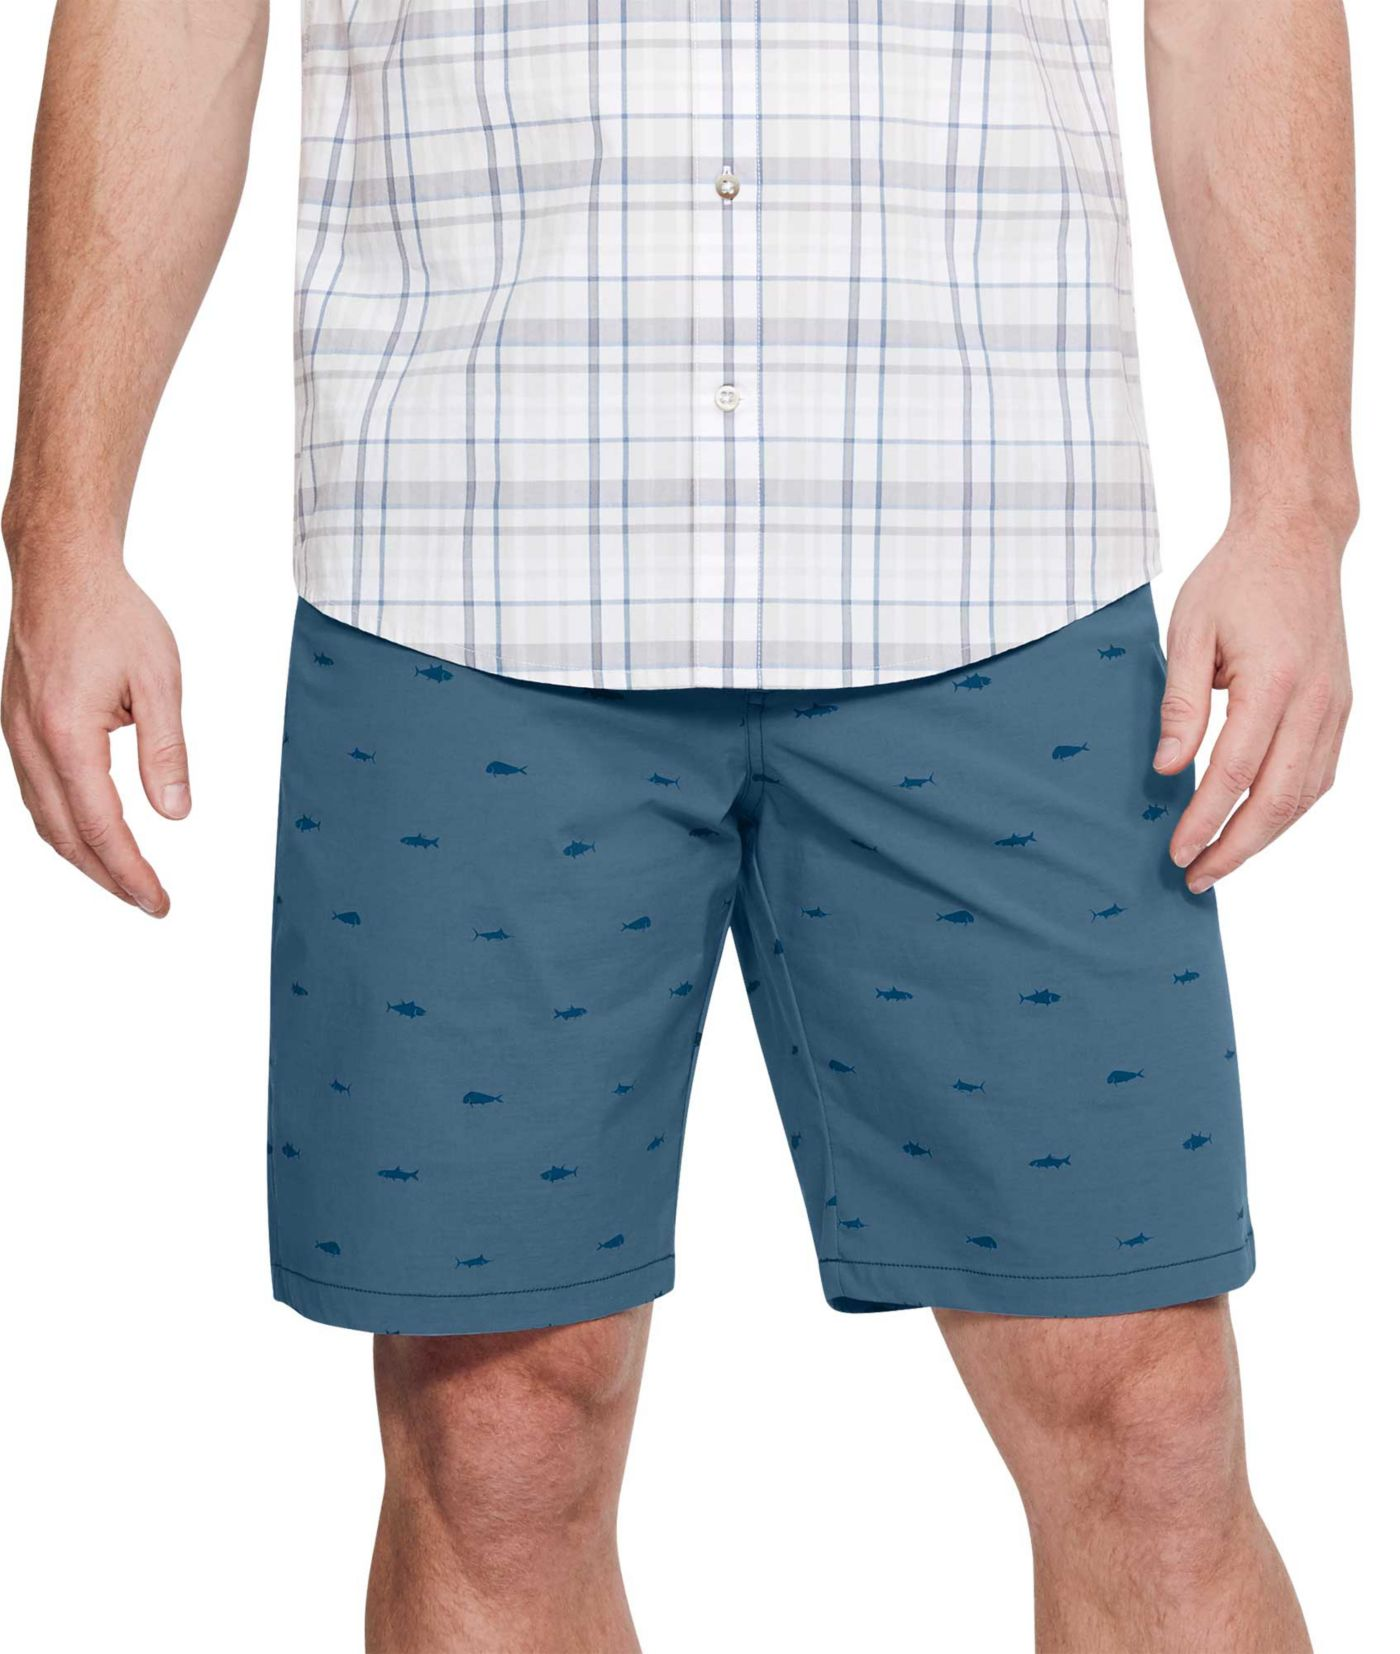 Under Armour Men's Fish Hunter 2.0 Shorts